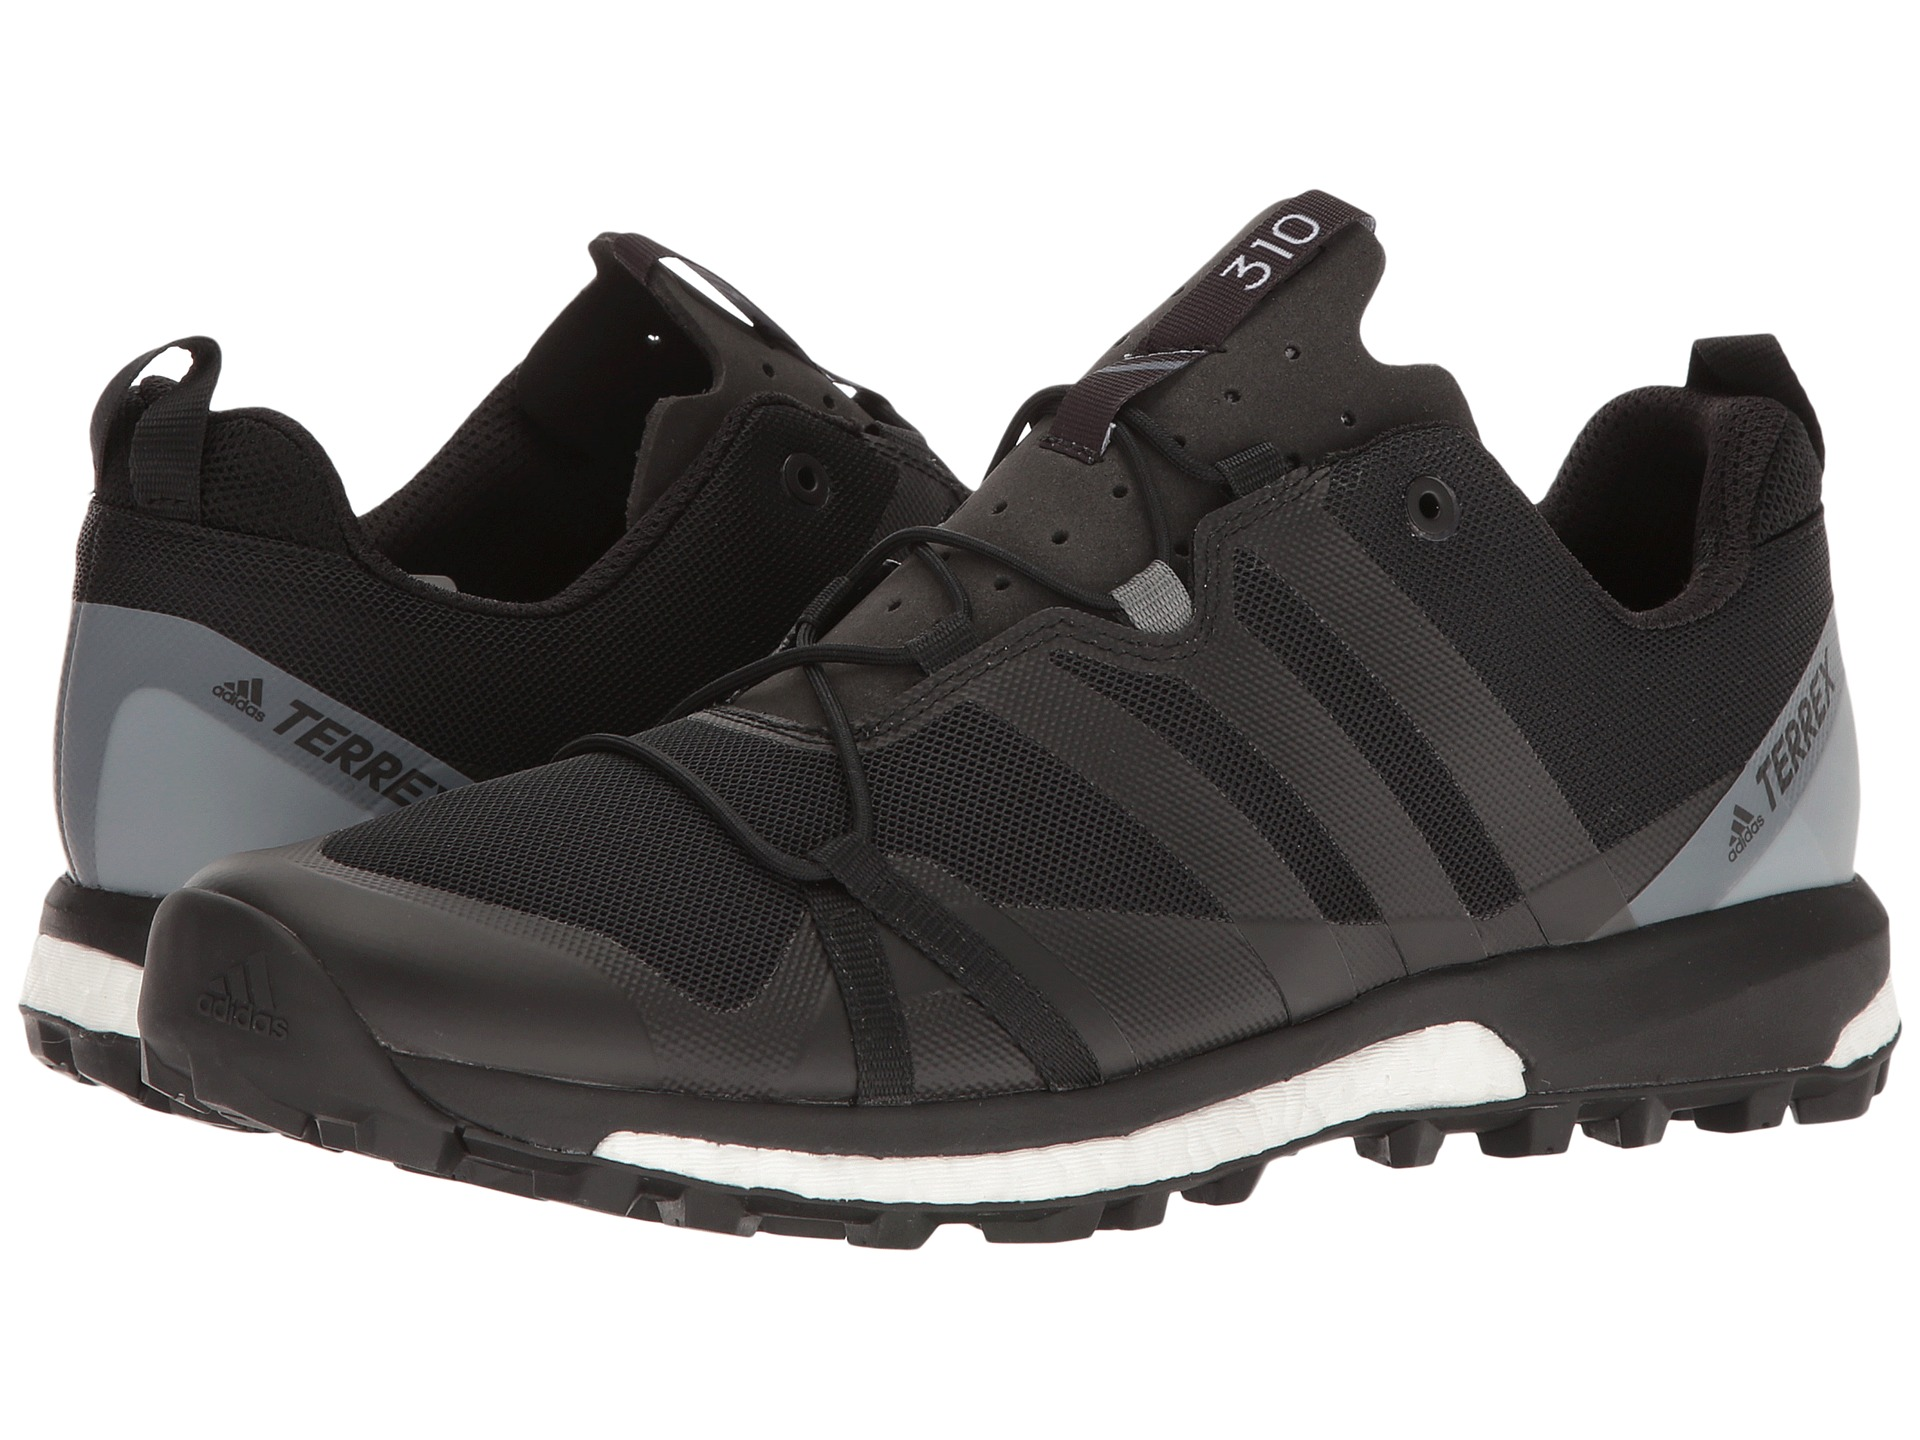 ac1a55801729 Adidas Terrex Agravic Bb0960 Férfi Outdoor Cipő | Outdoor cipő